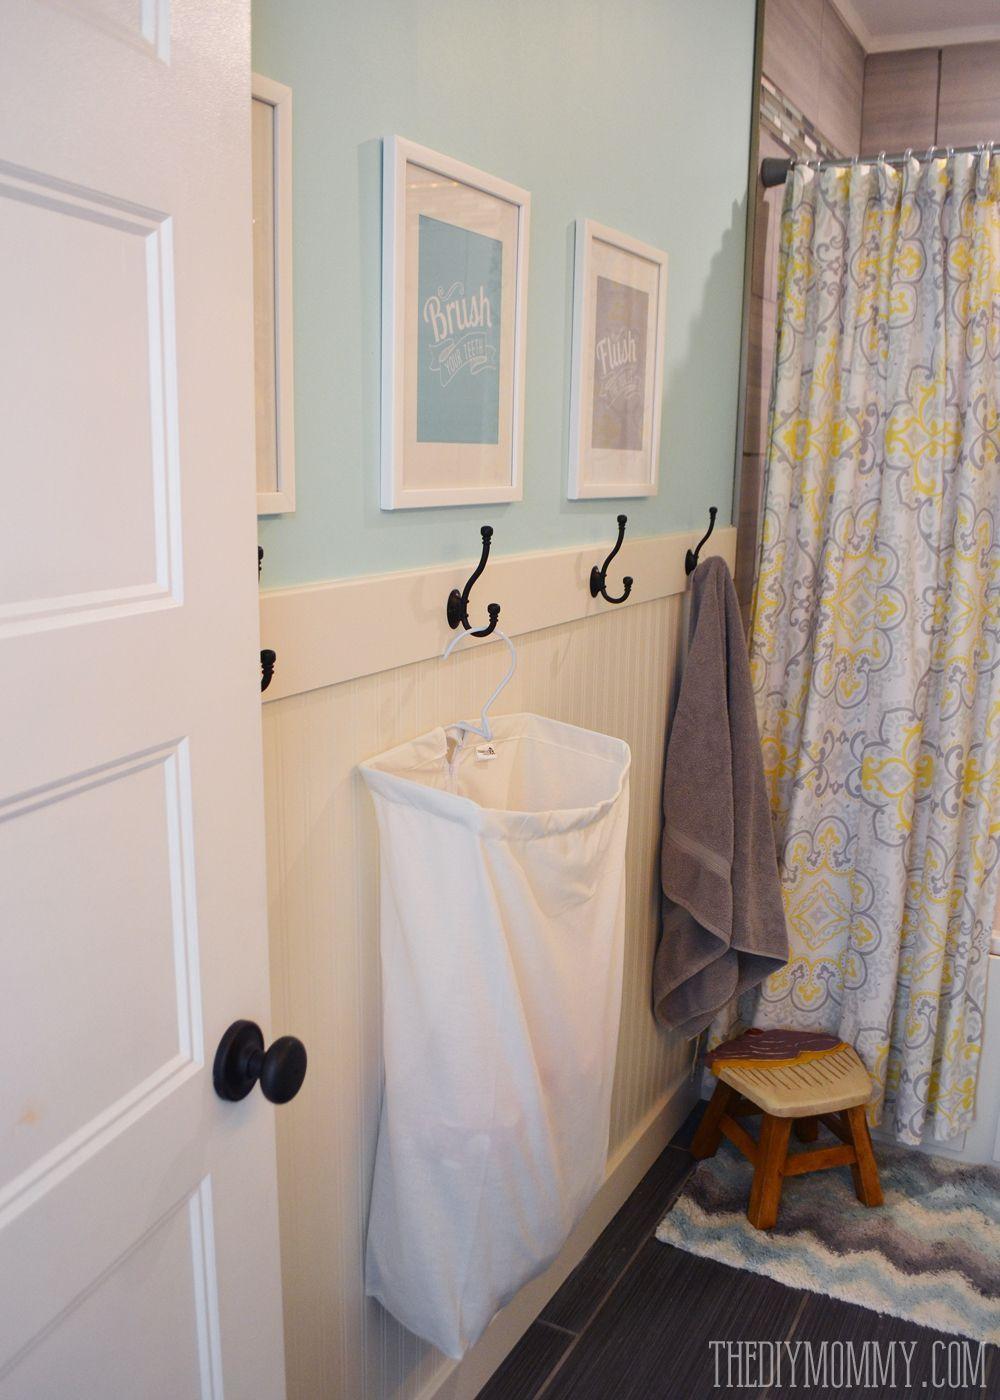 How to install an easy diy beadboard hook wall in a bathroom itus